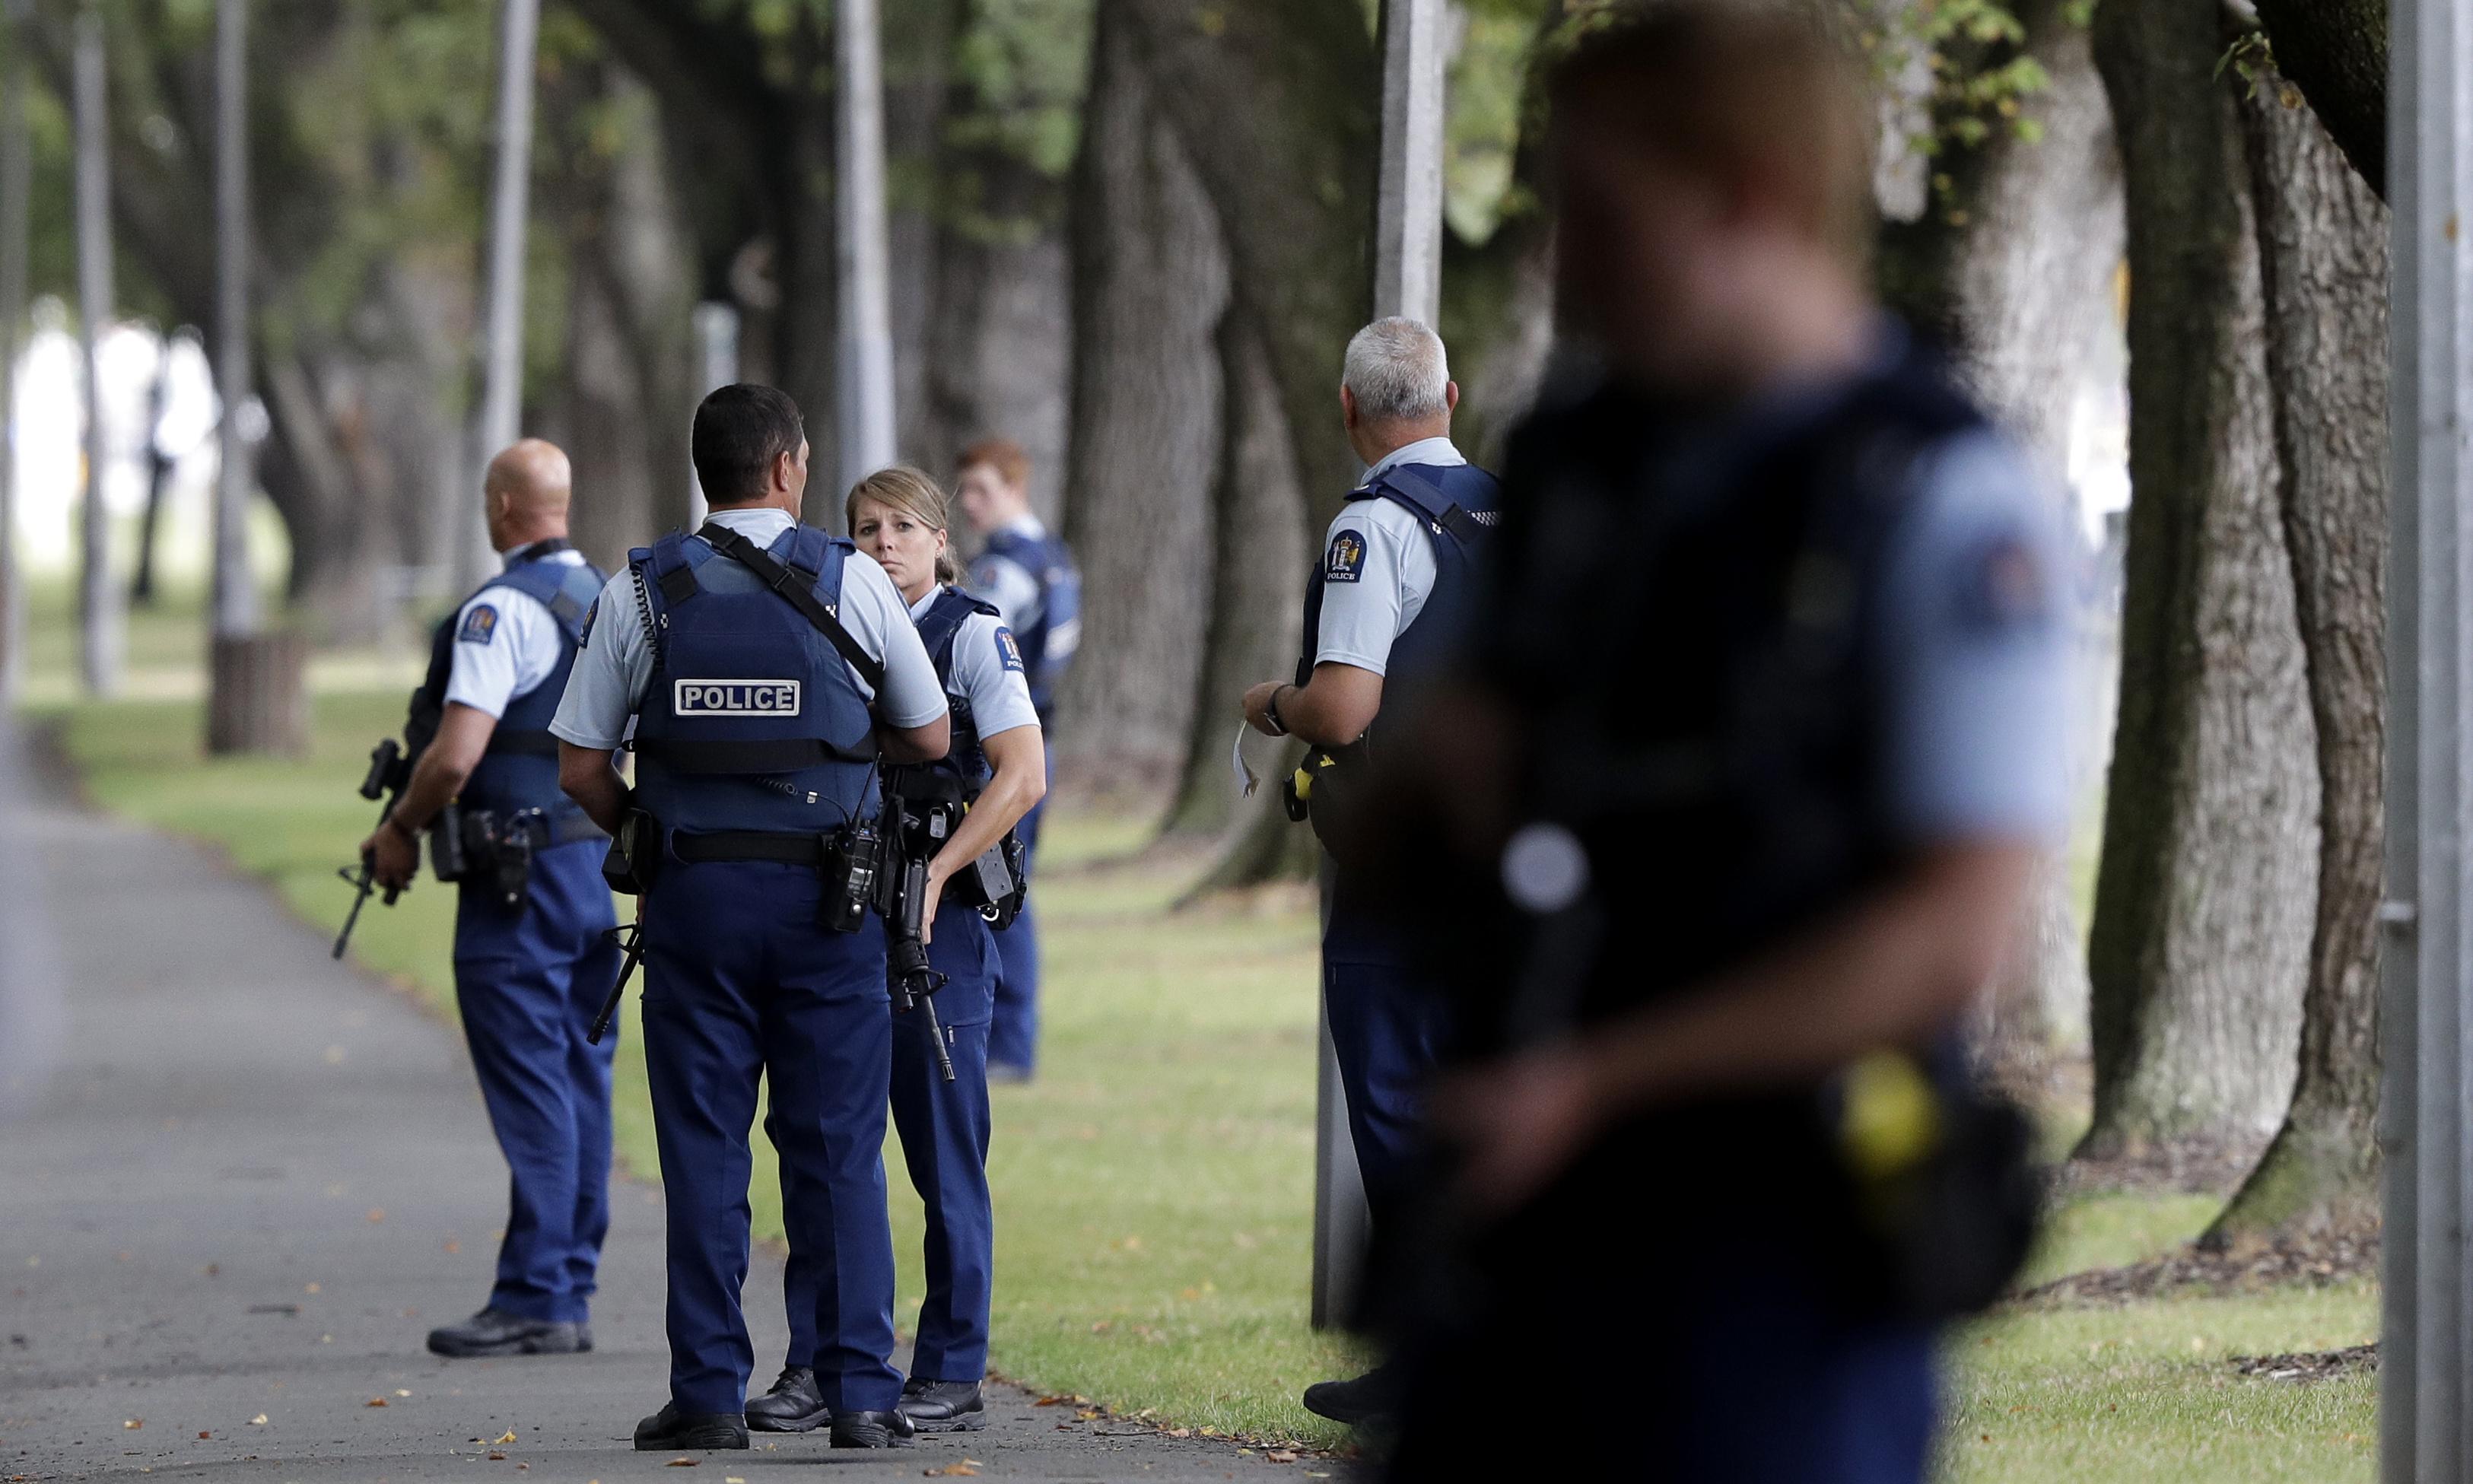 Australian media broadcast footage from Christchurch shootings despite police pleas